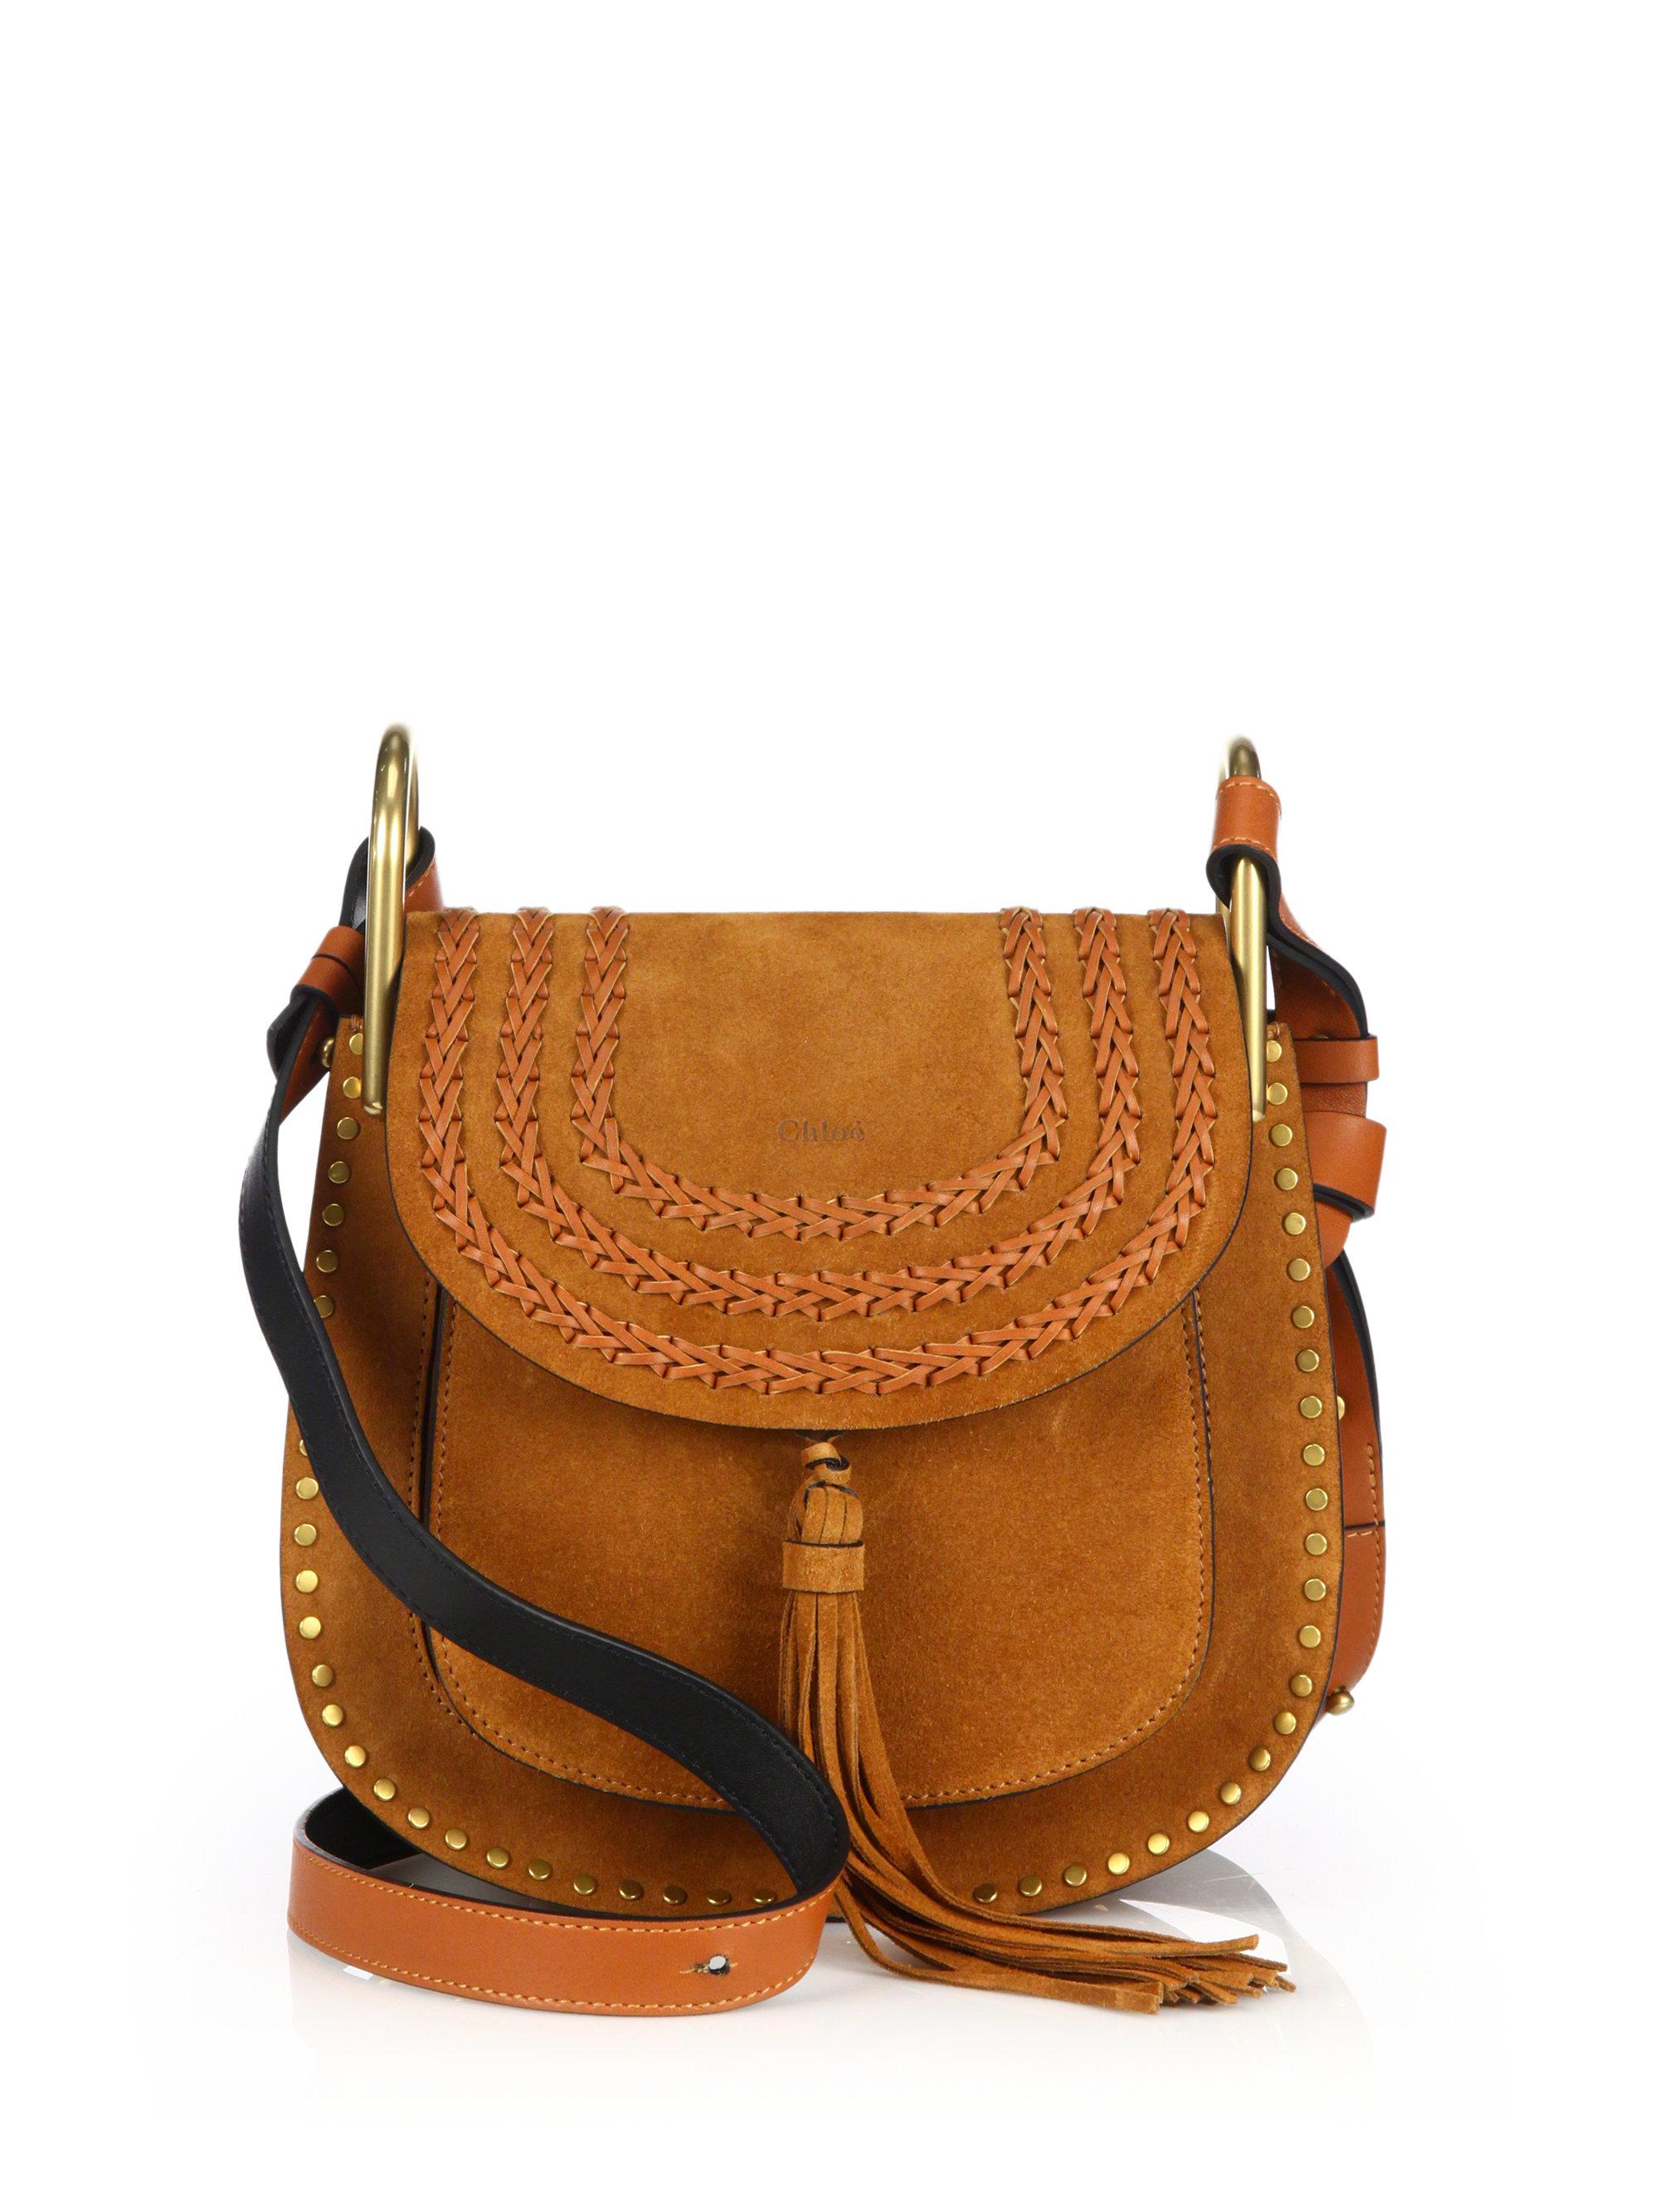 Chlo�� Hudson Small Suede Shoulder Bag in Khaki | Lyst